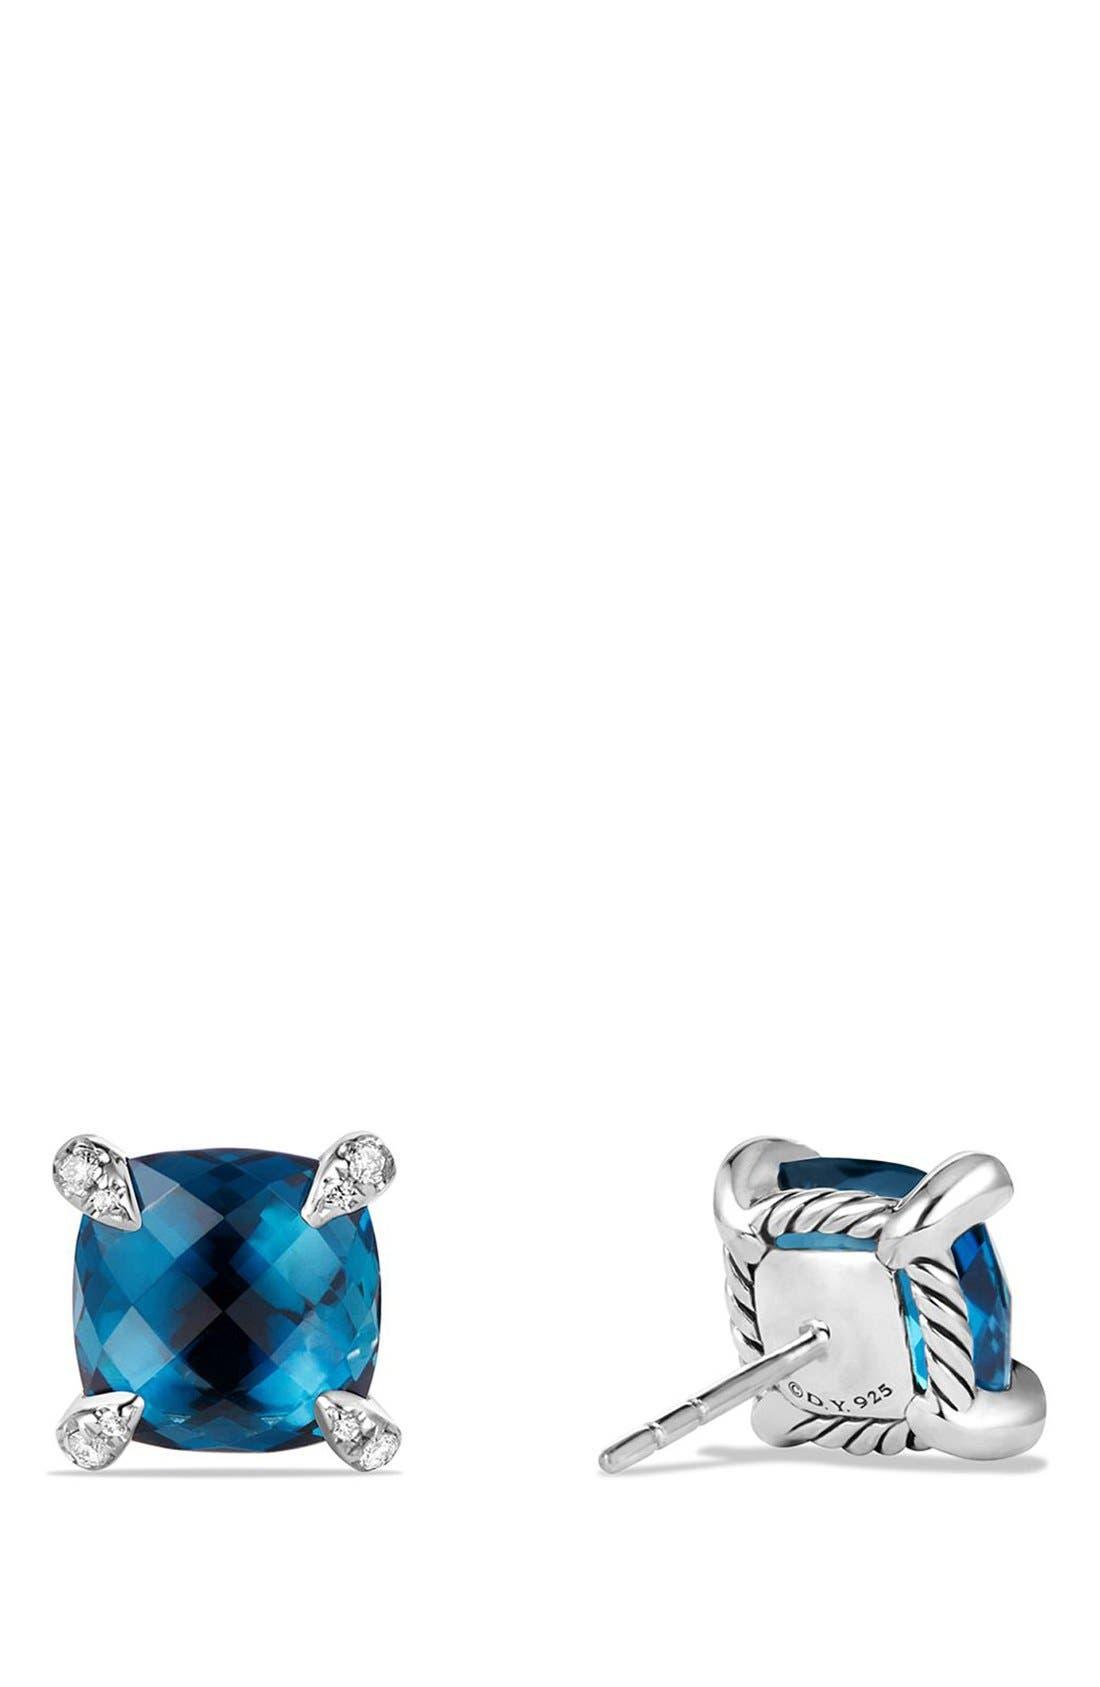 ,                             'Châtelaine' Earrings with Semiprecious Stones and Diamonds,                             Alternate thumbnail 2, color,                             SILVER/ HAMPTON BLUE TOPAZ